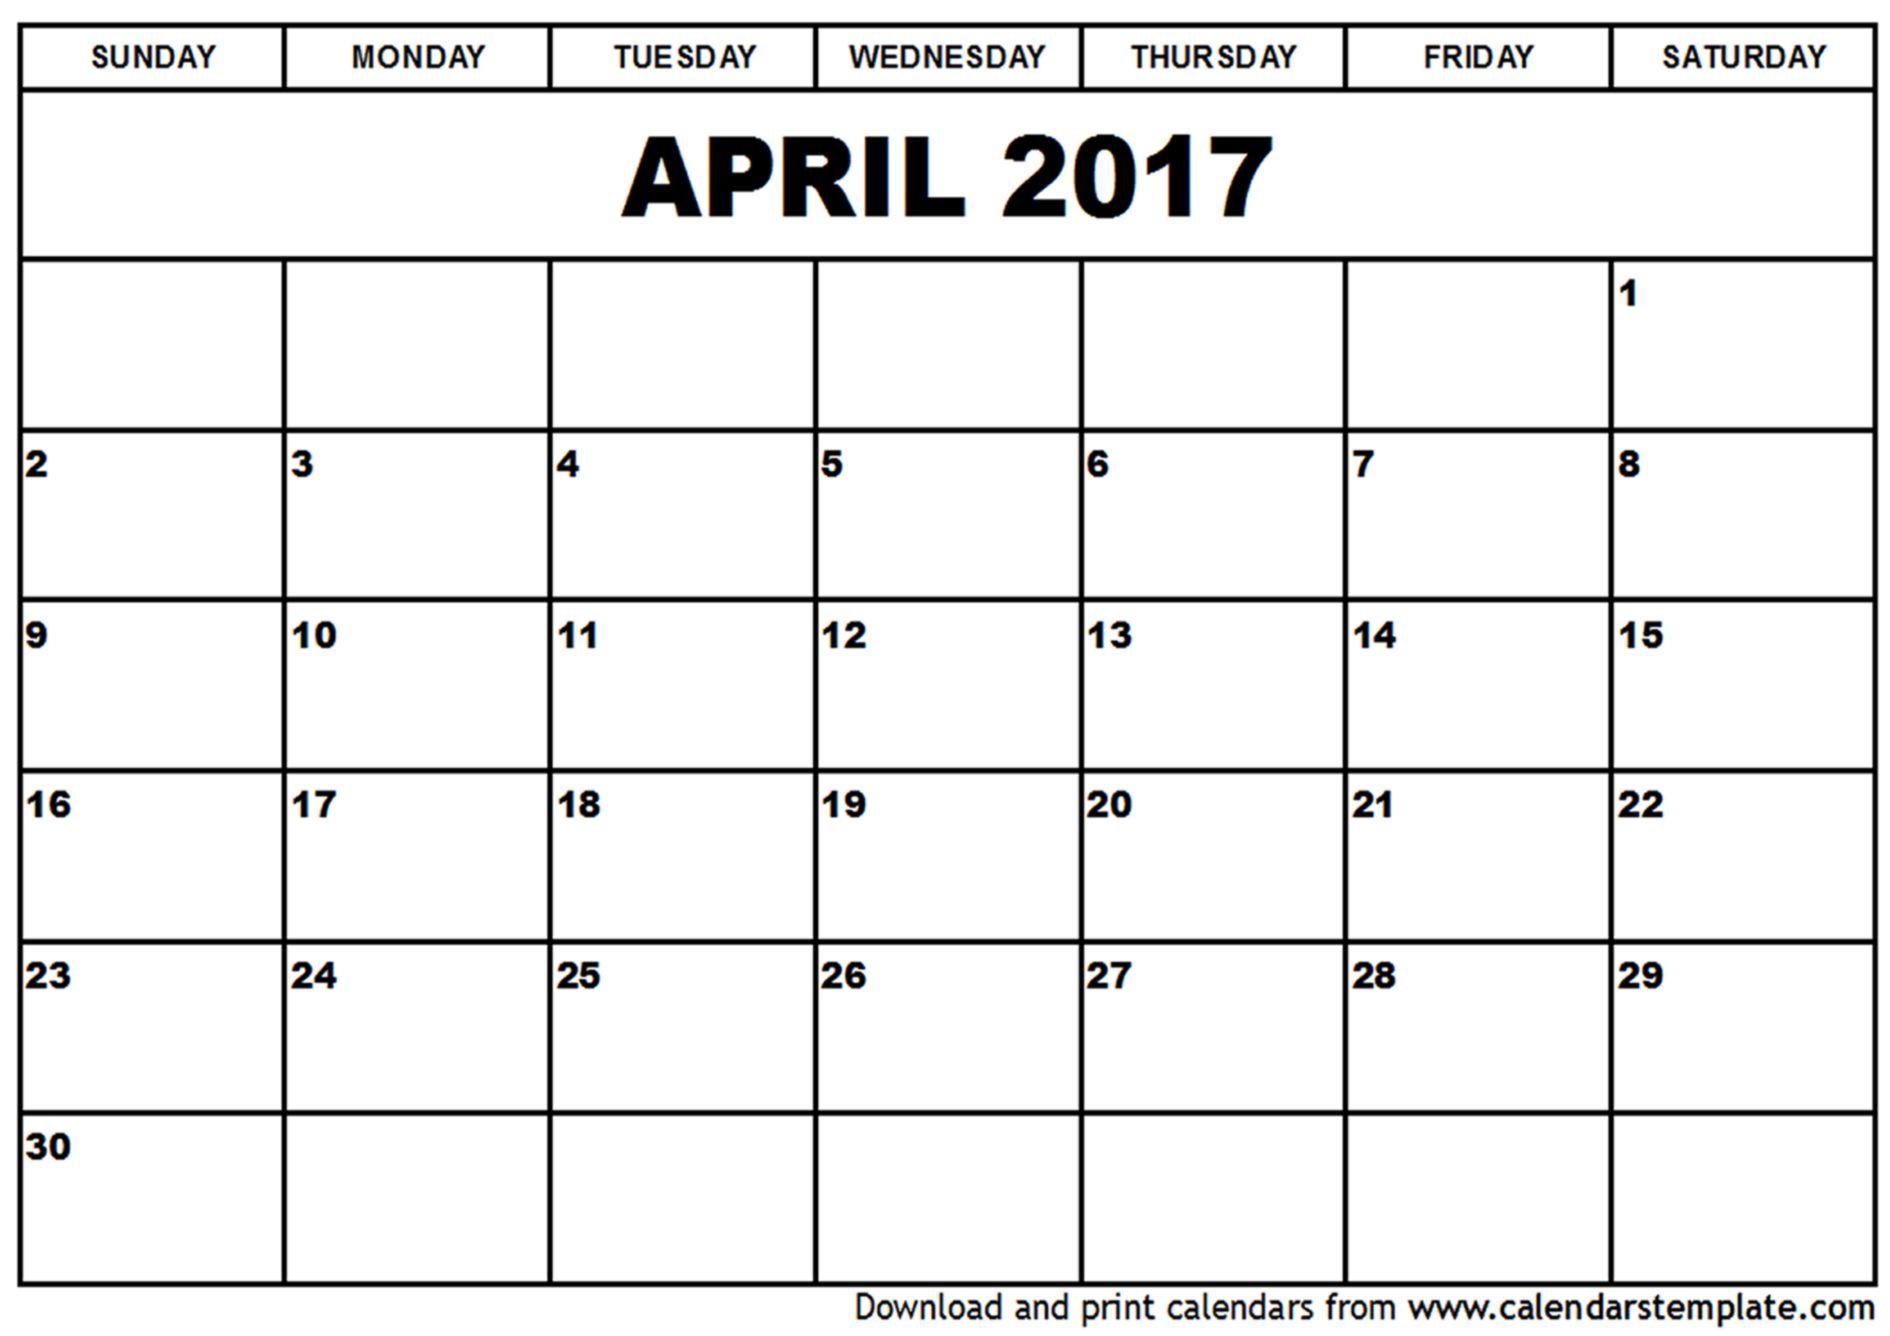 free editable calendar templates 2017